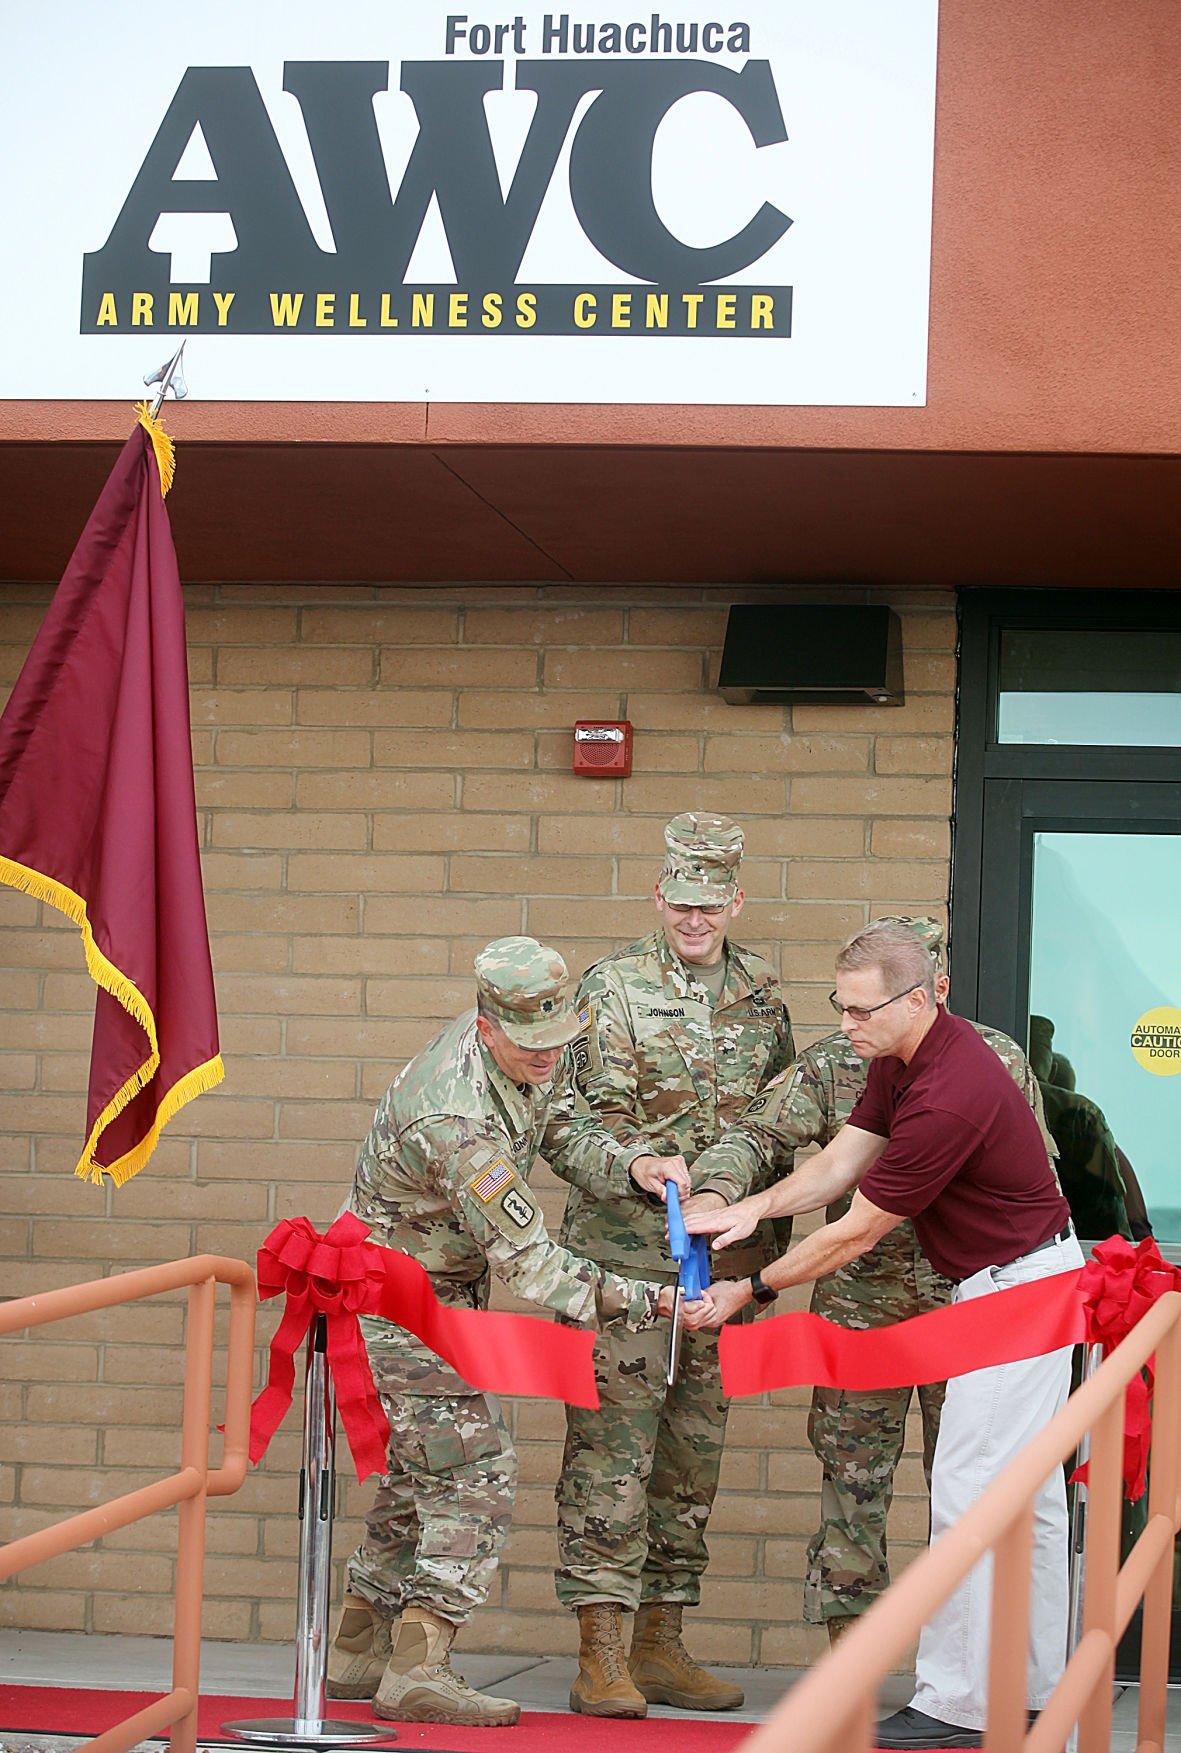 army wellness center